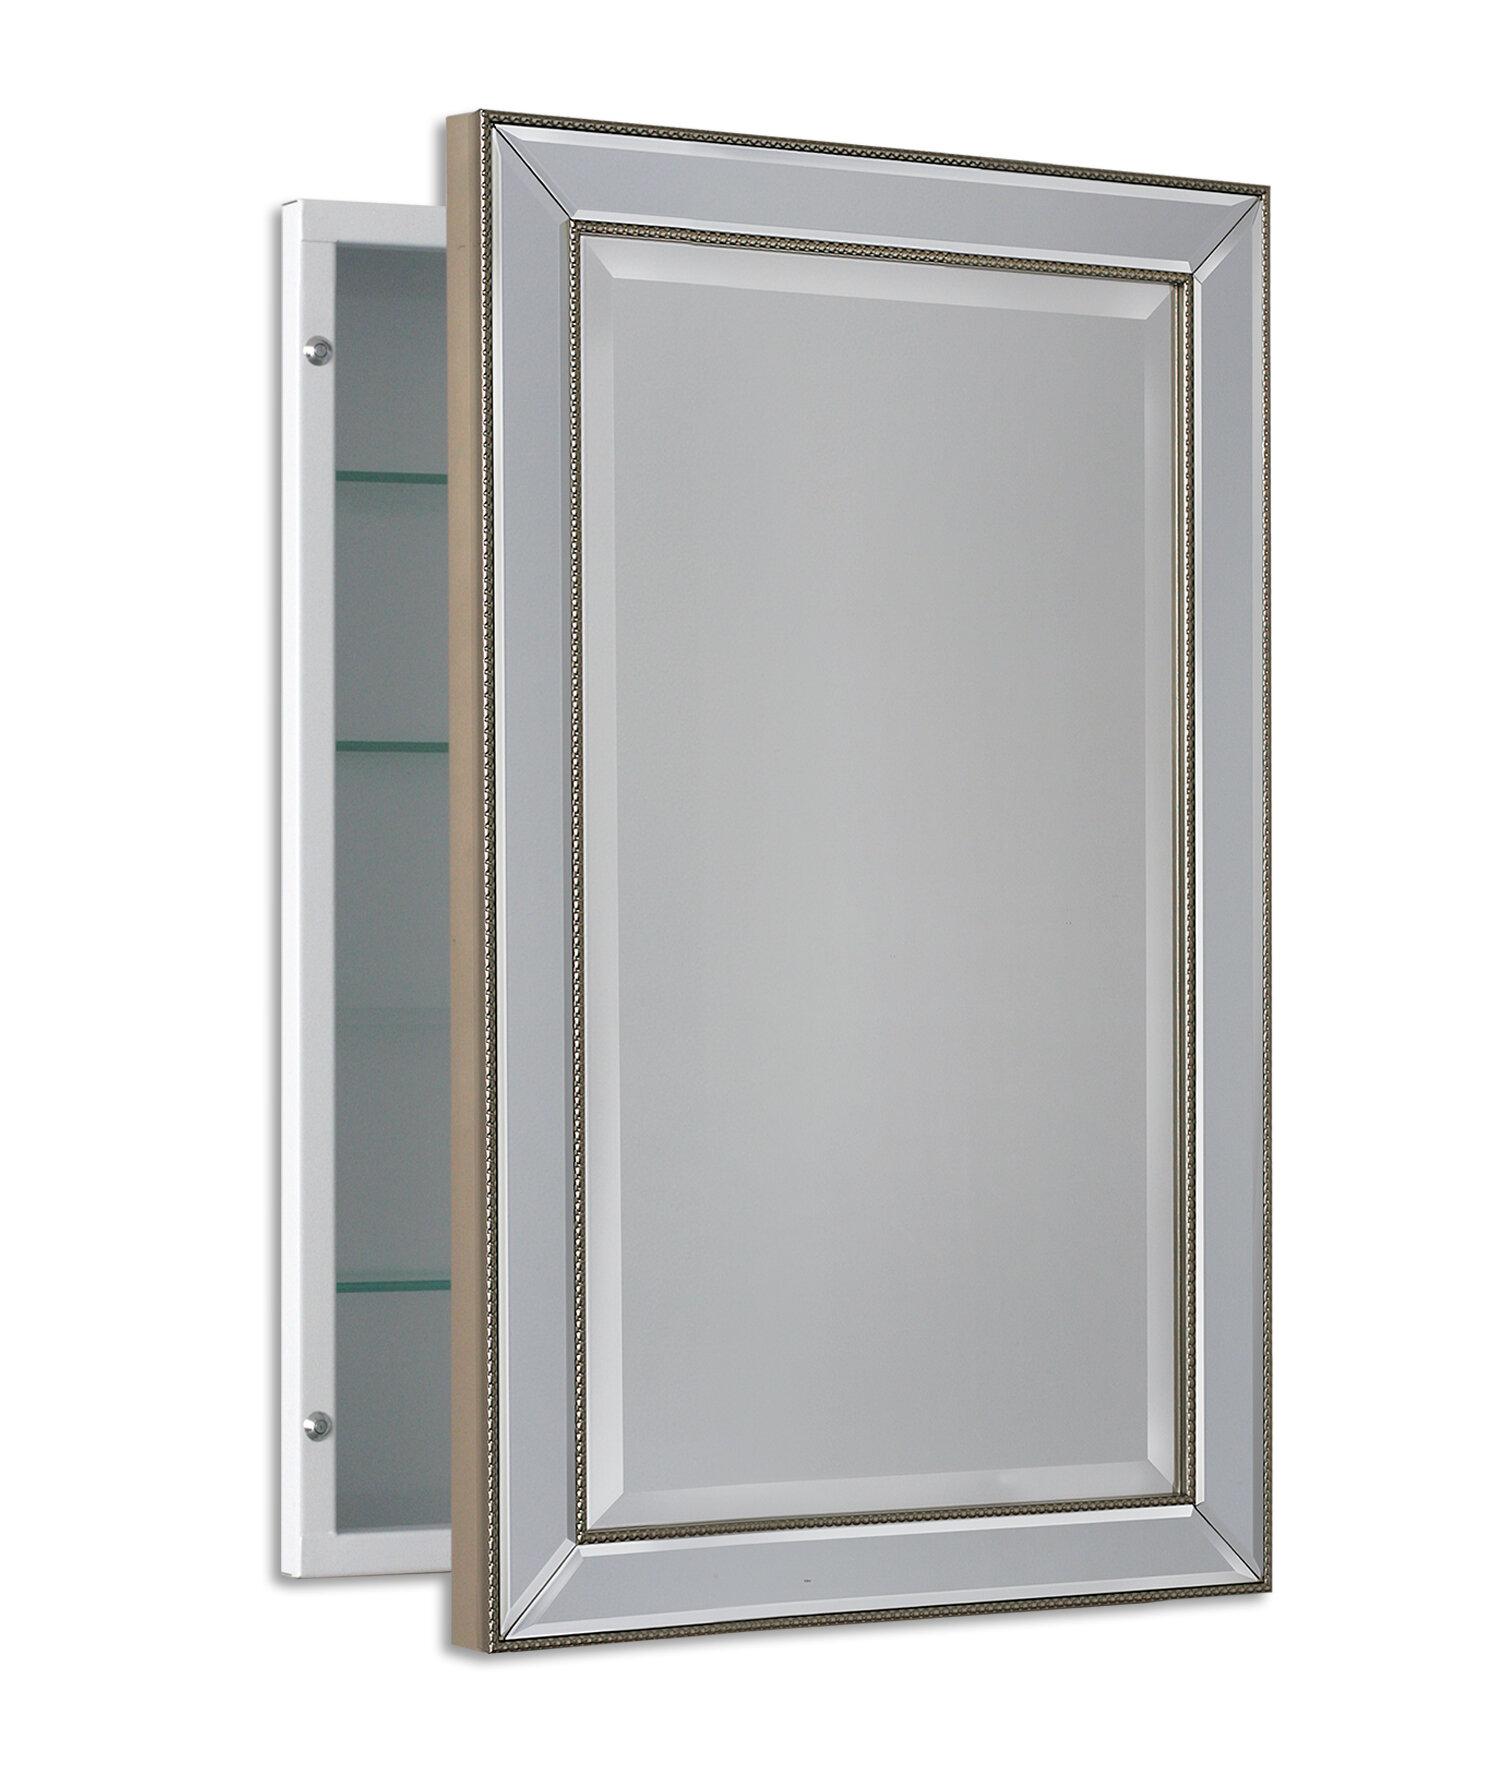 Weslaco Beaded Recessed Framed 1 Door Medicine Cabinet With 3 Adjustable Shelves Reviews Birch Lane